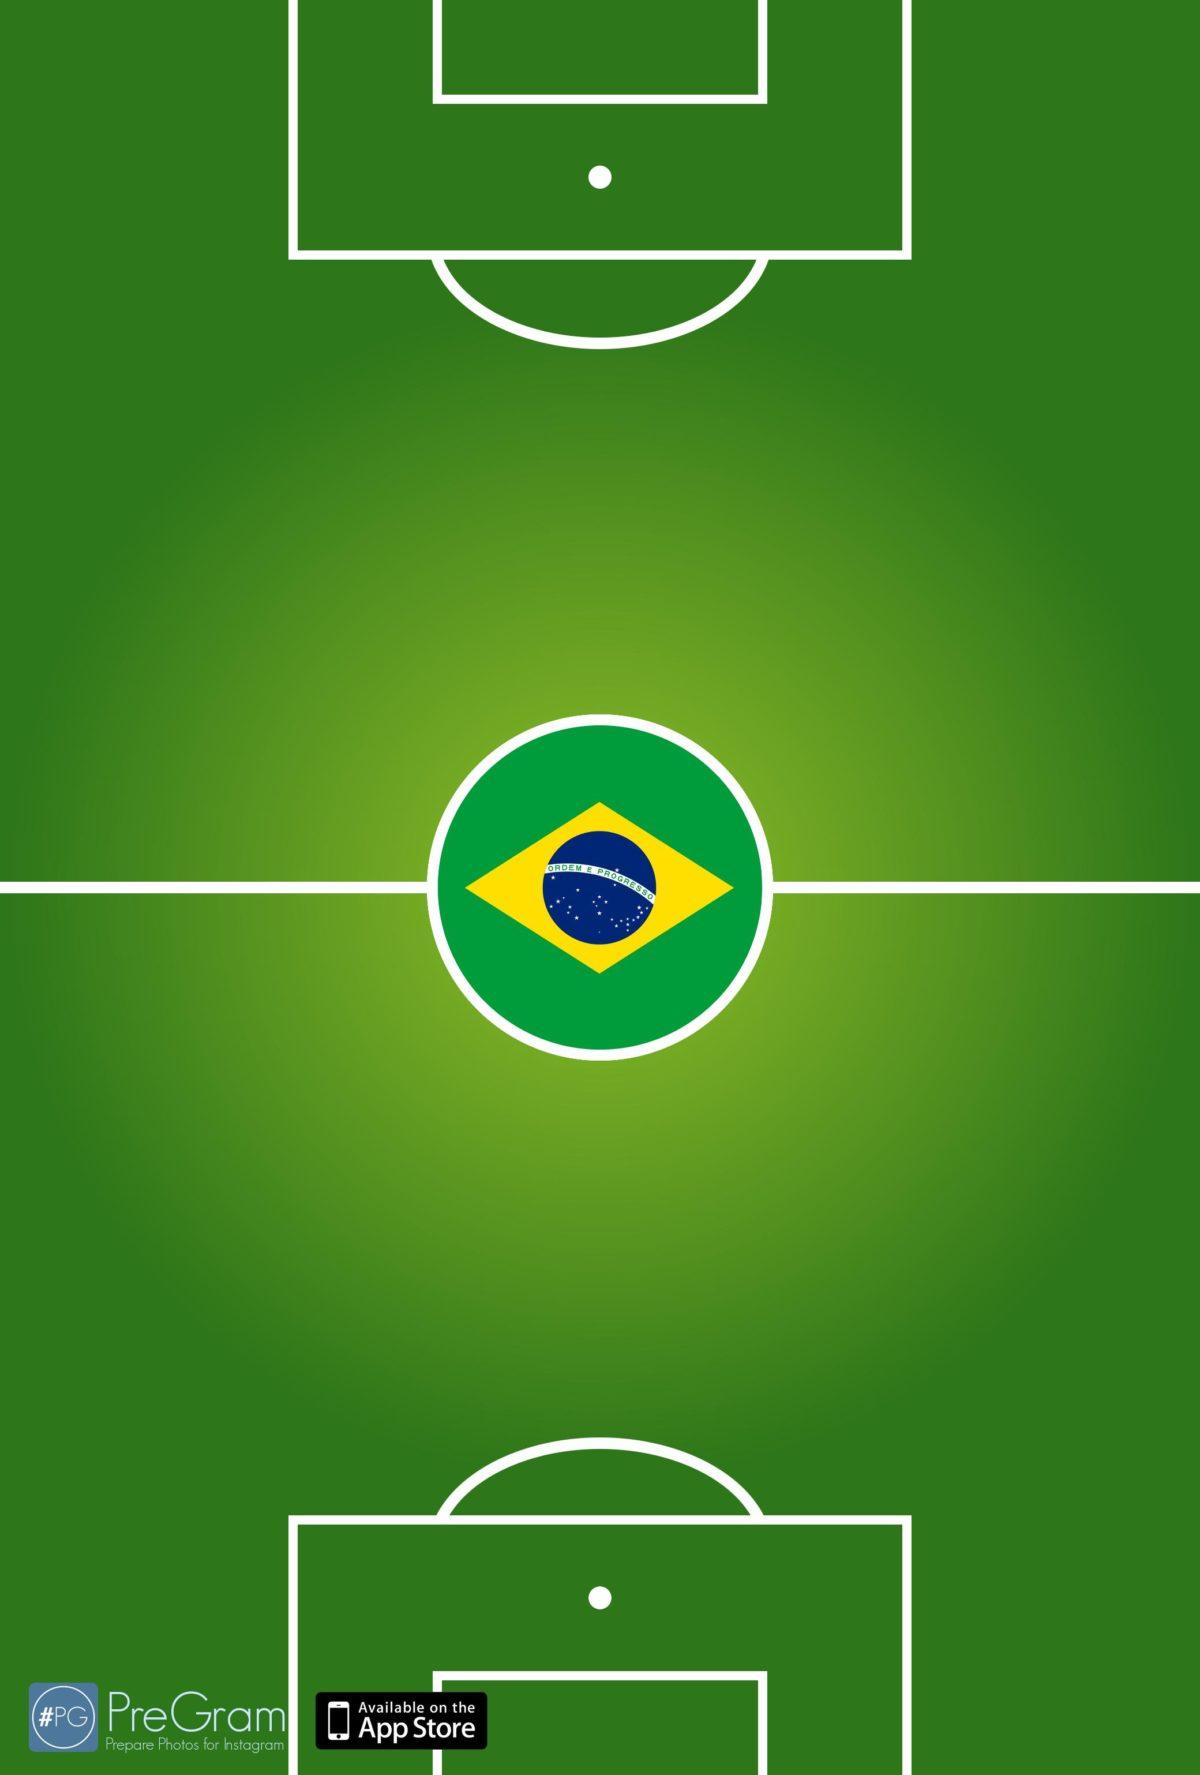 Worldcup 2014 Brazil: iPhone Wallpaper | PreGram